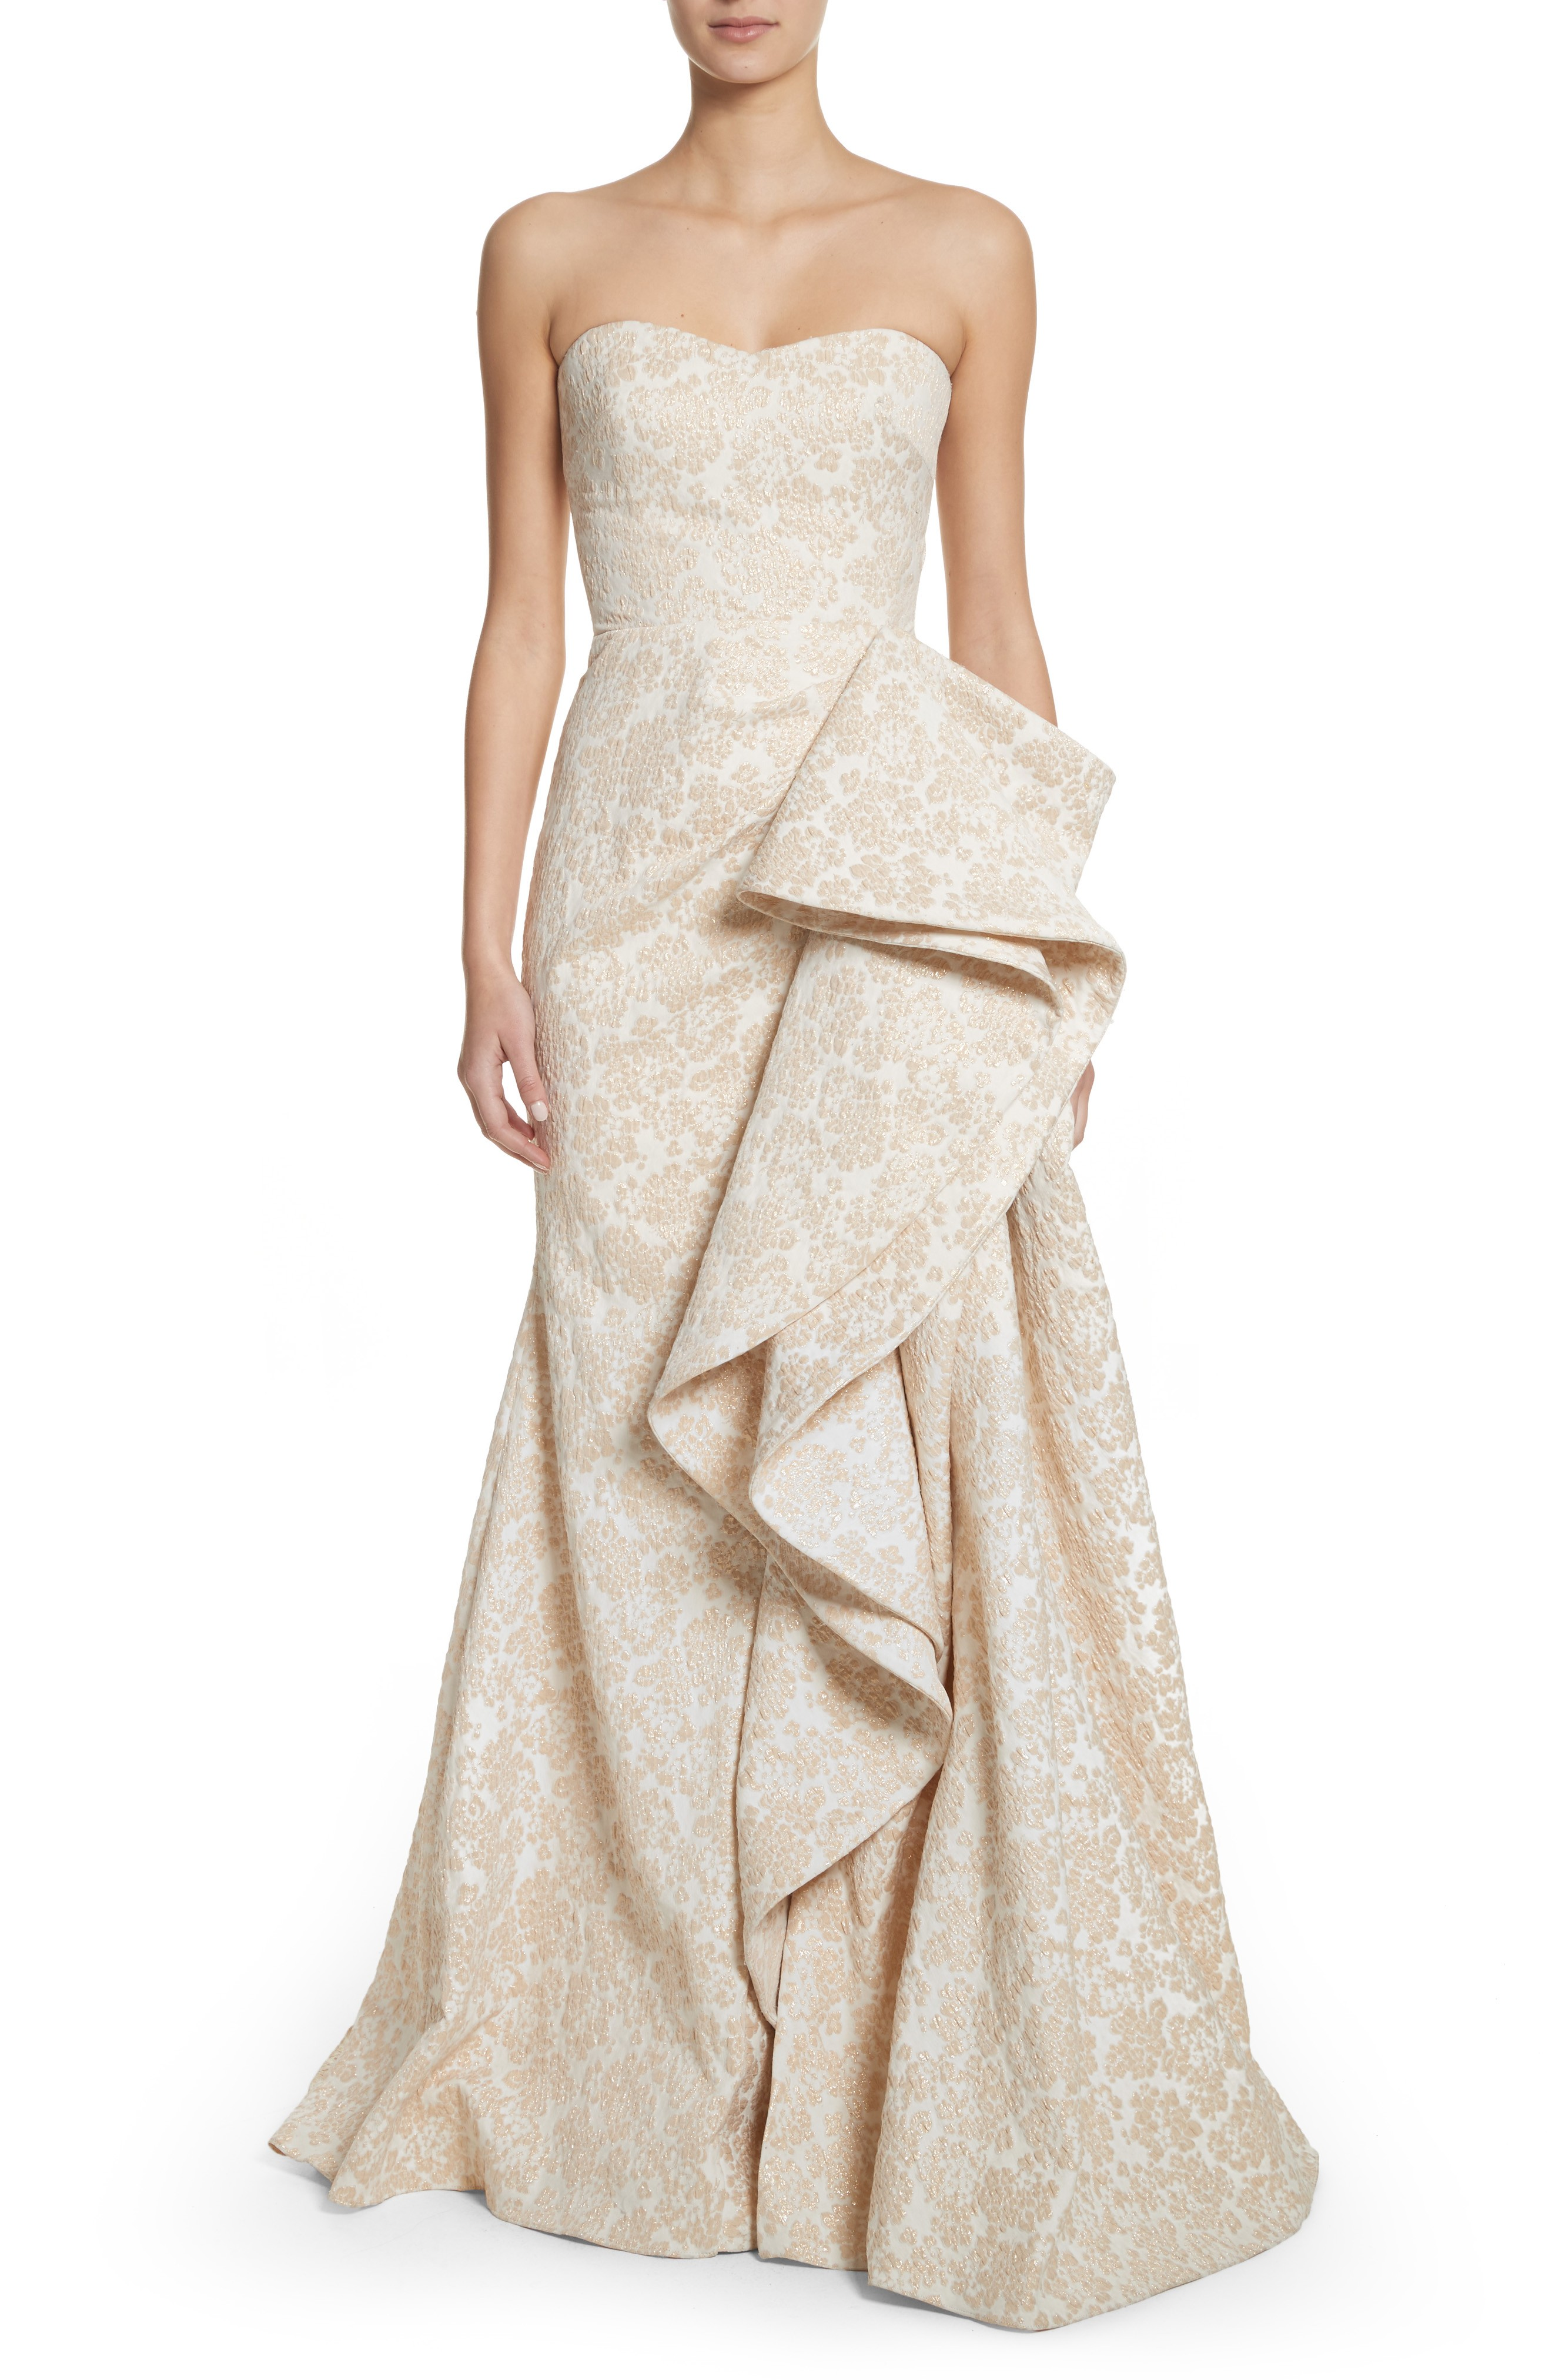 BADGLEY MISCHKA Platinum Sculptural Ruffle Ivory Gold Gown - We ...